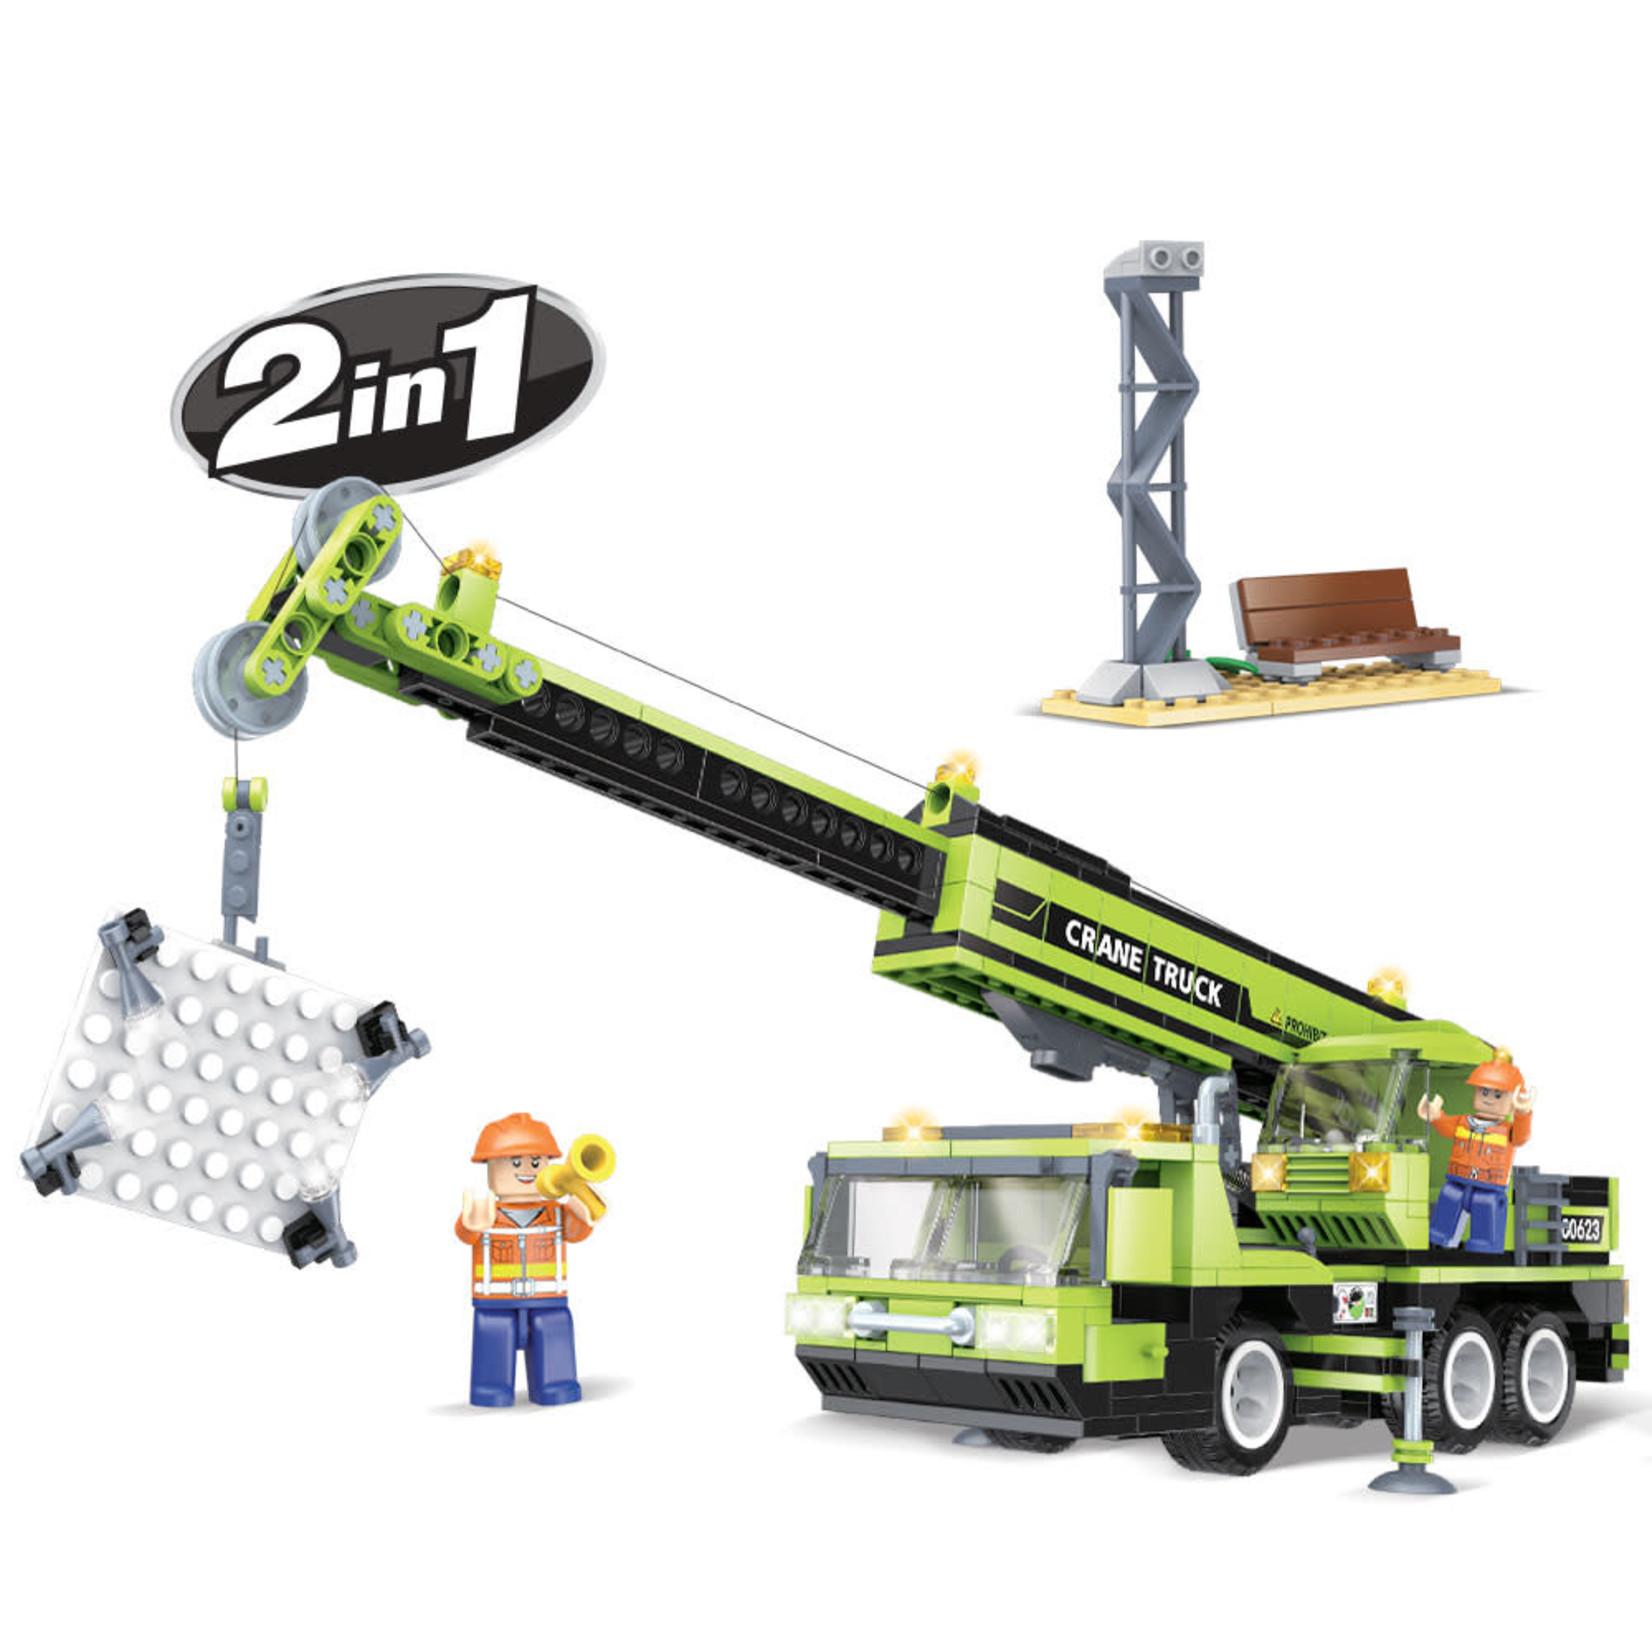 Brictek Construction - Crane Truck